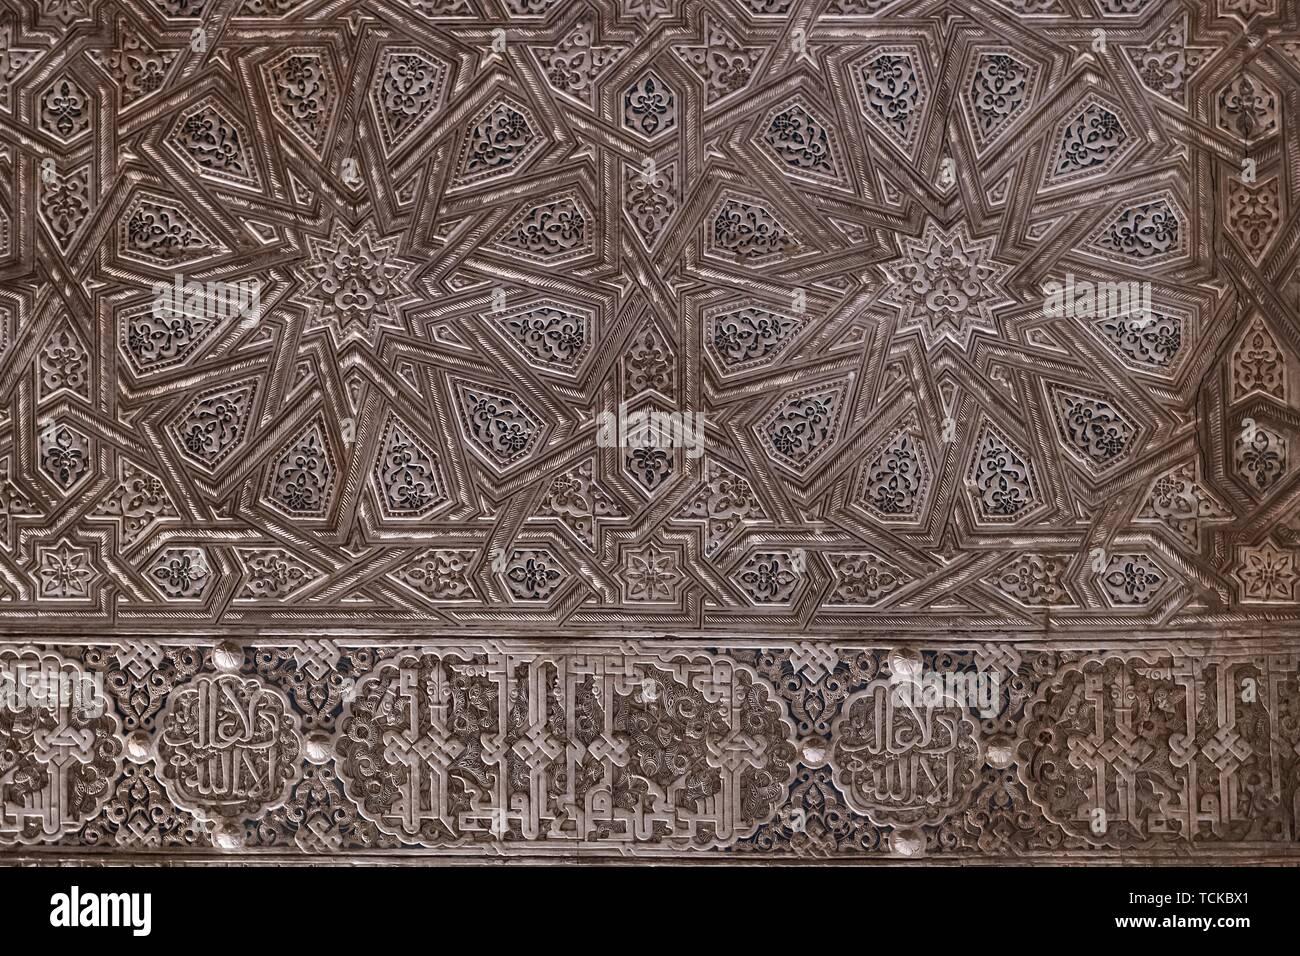 Wall with geometric Moorish plaster decorations, Nasrid palaces, Alhambra, Granada, Andalusia, Spain Stock Photo